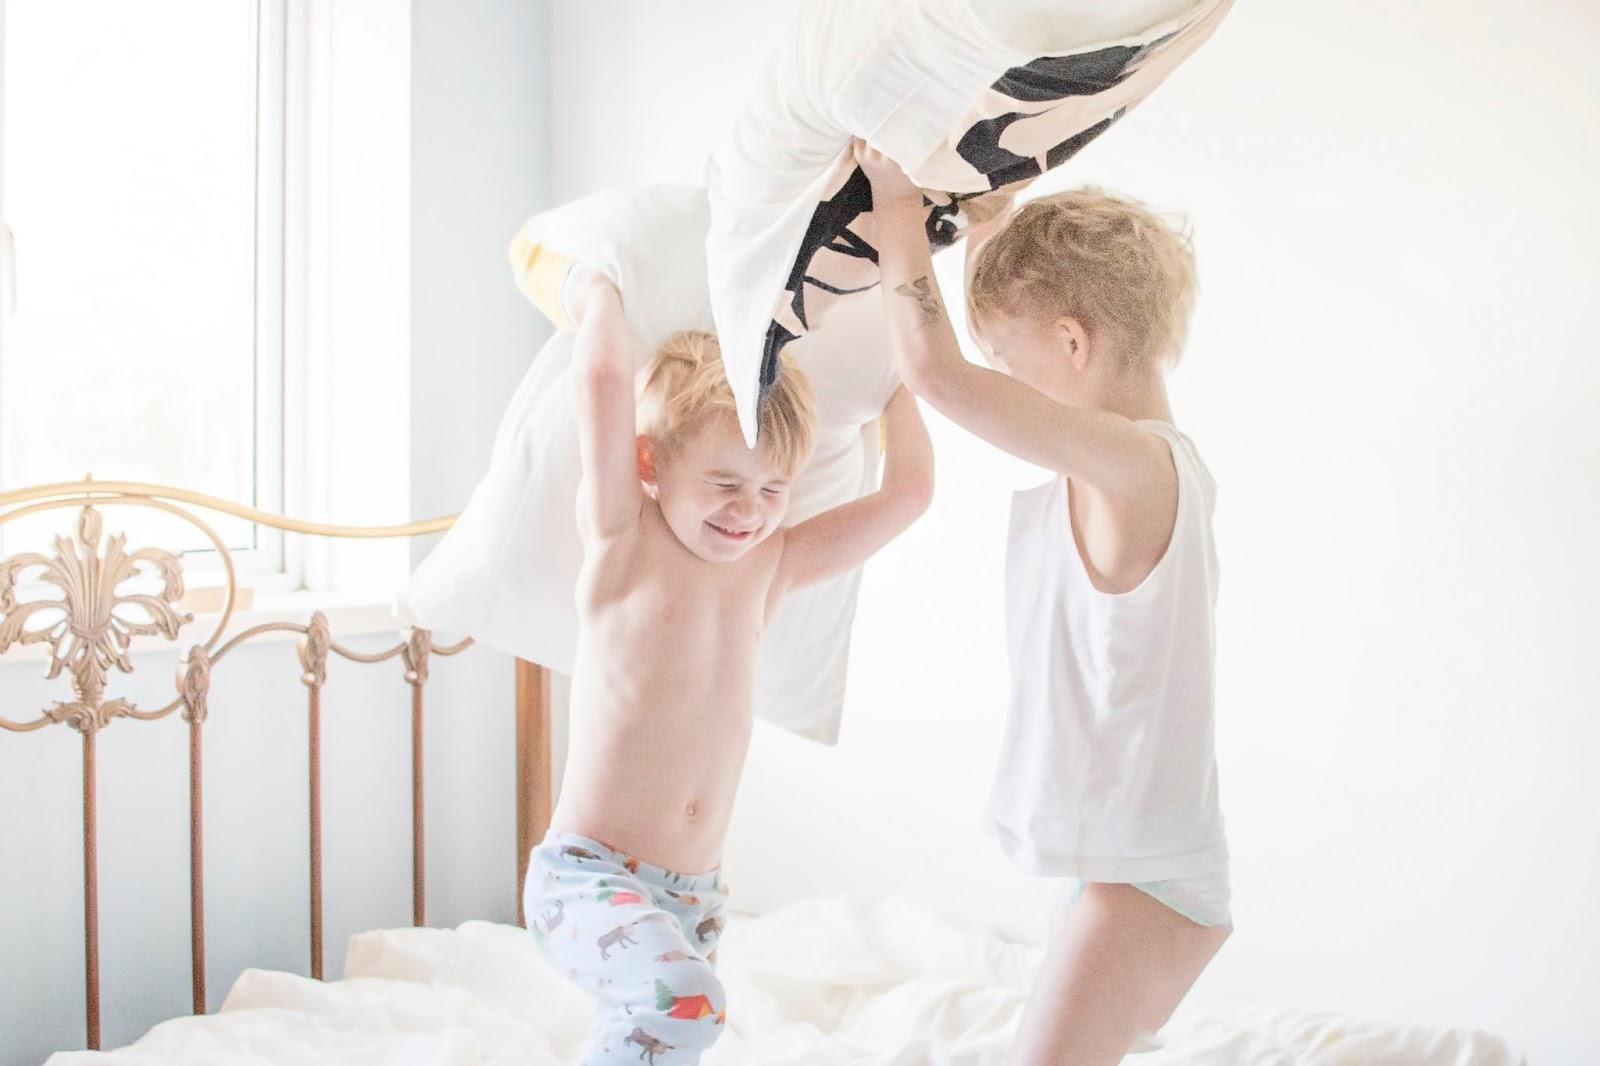 борьба подушками картинка вам воспользоваться